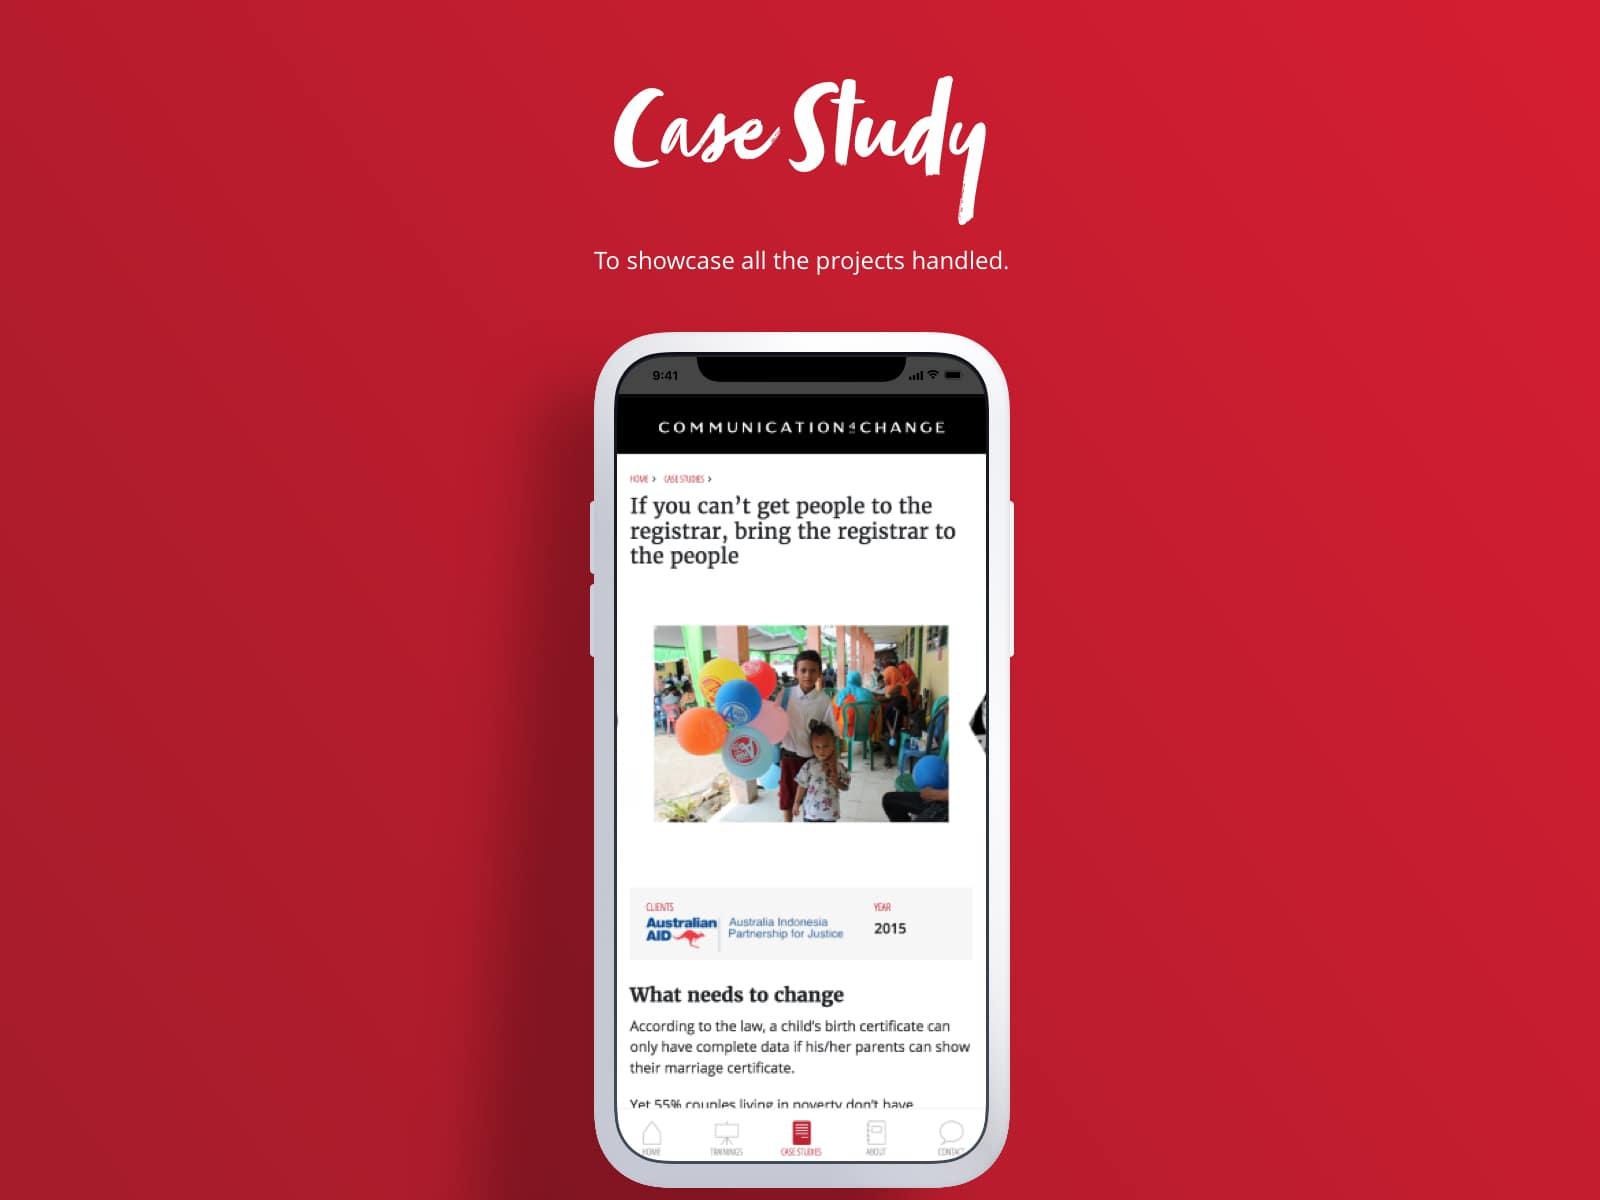 <p>Case Study</p>